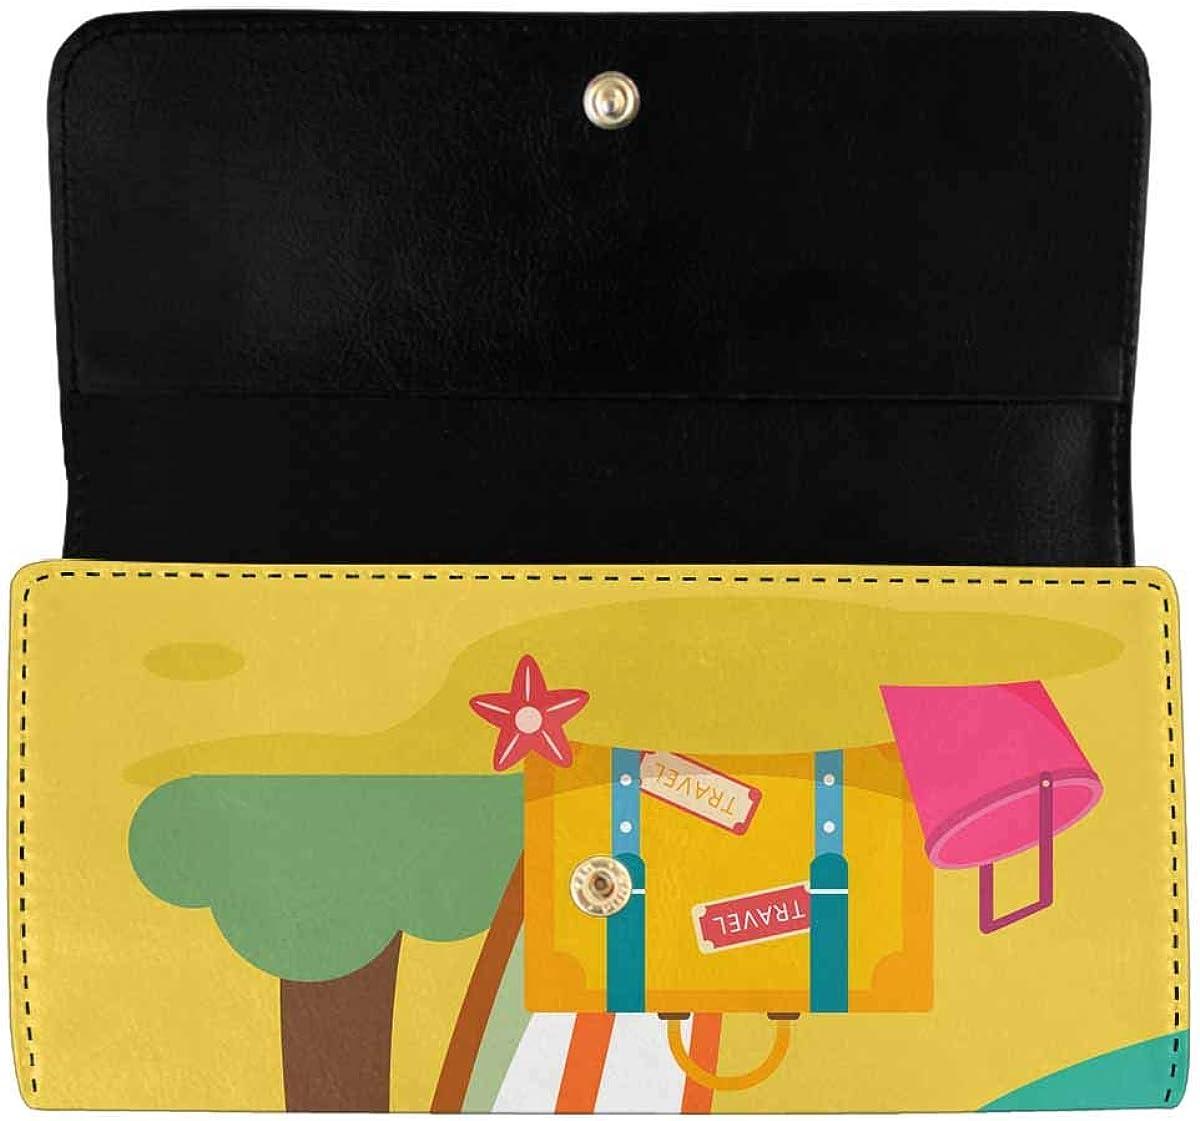 INTERESTPRINT Women's Trifold Clutch Purses Fun Holiday Beach Pattern PU Leather Card Holder